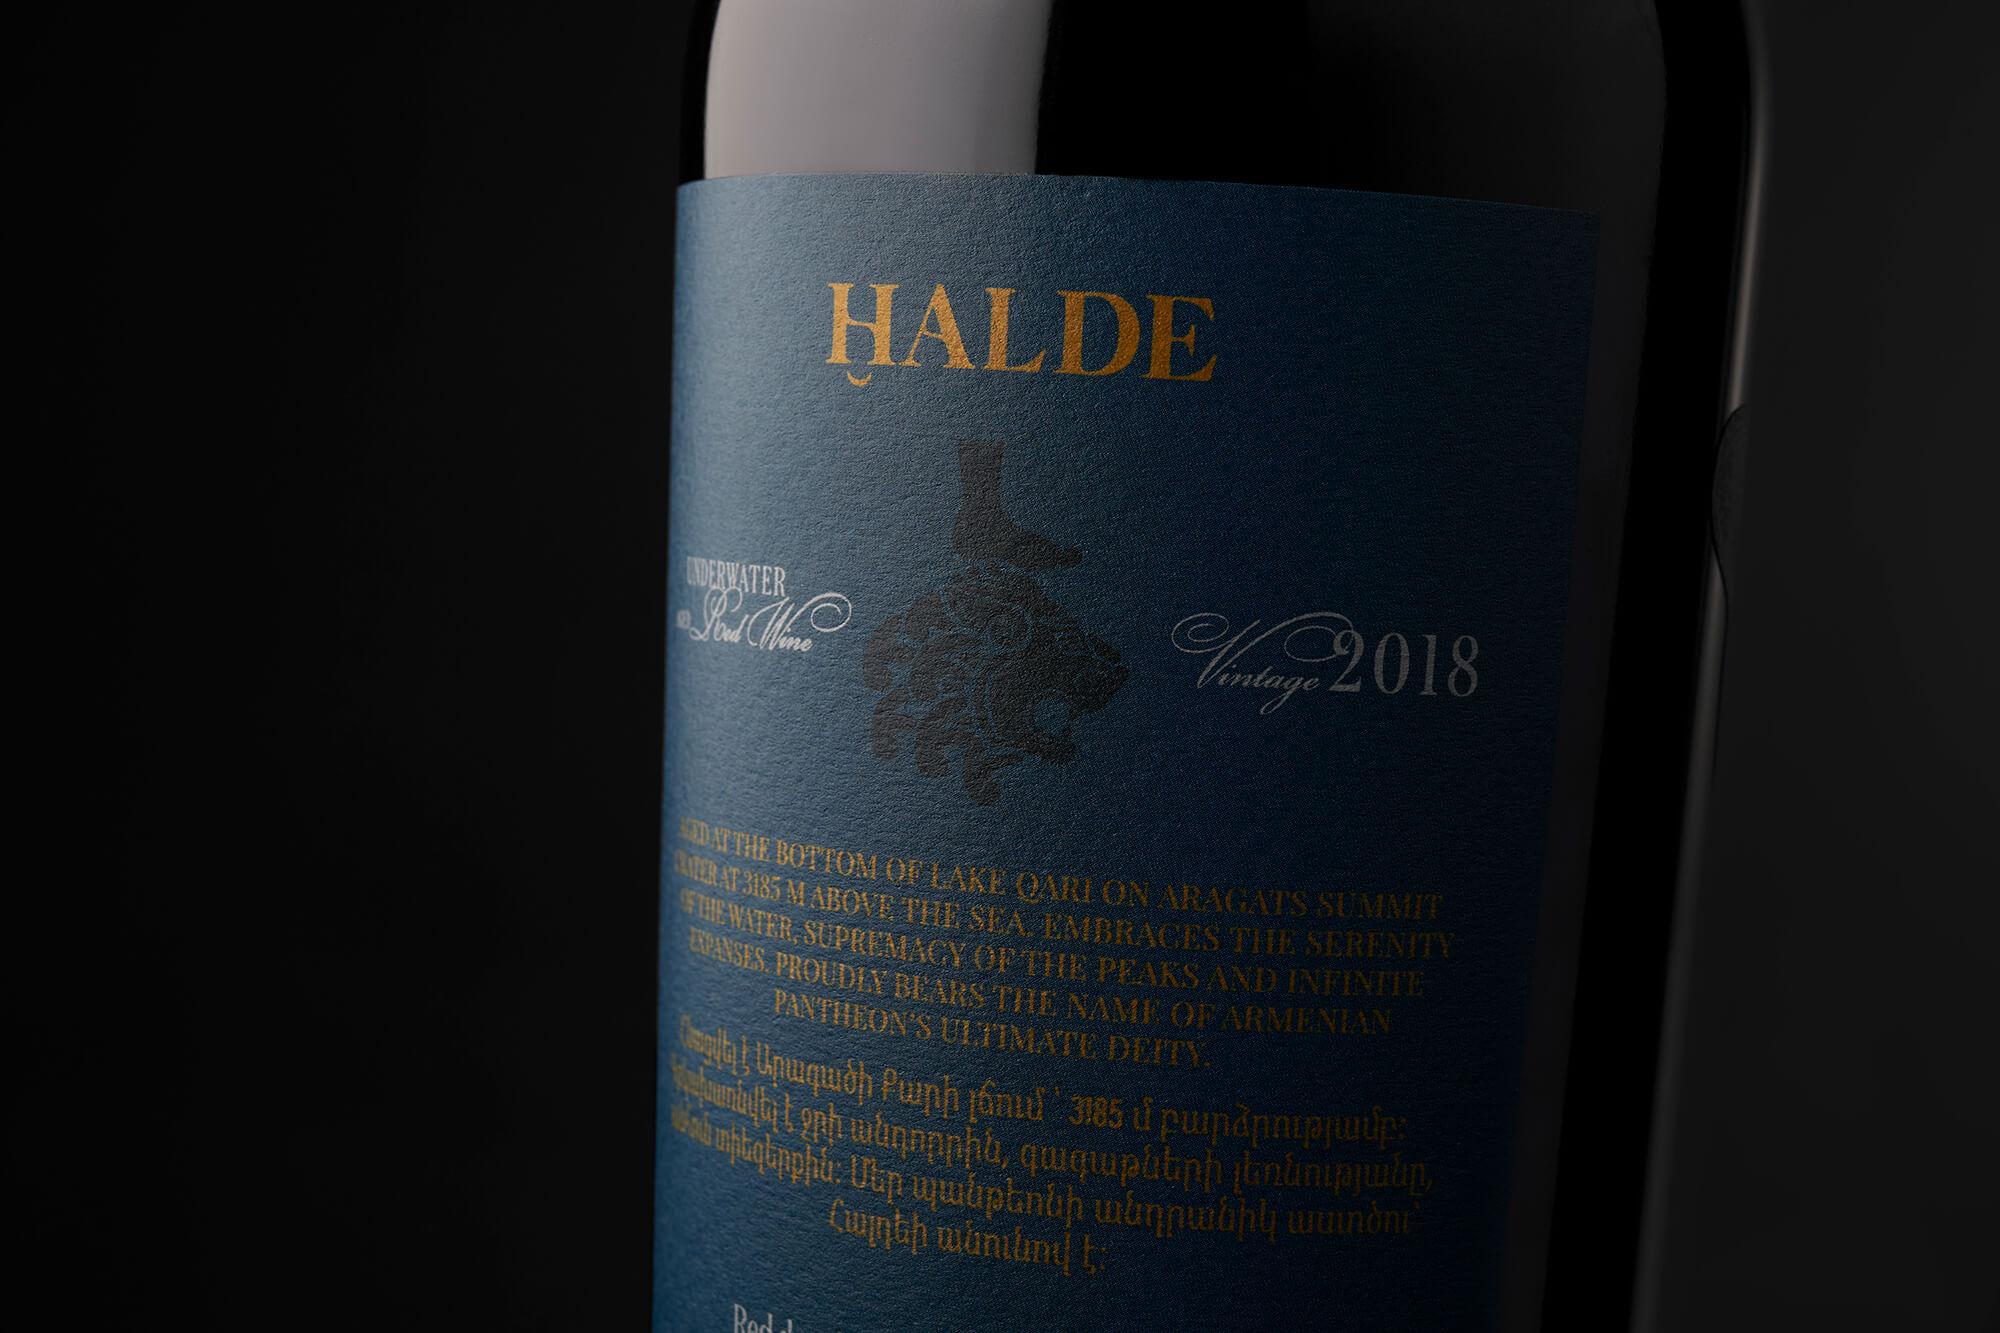 HALDE5